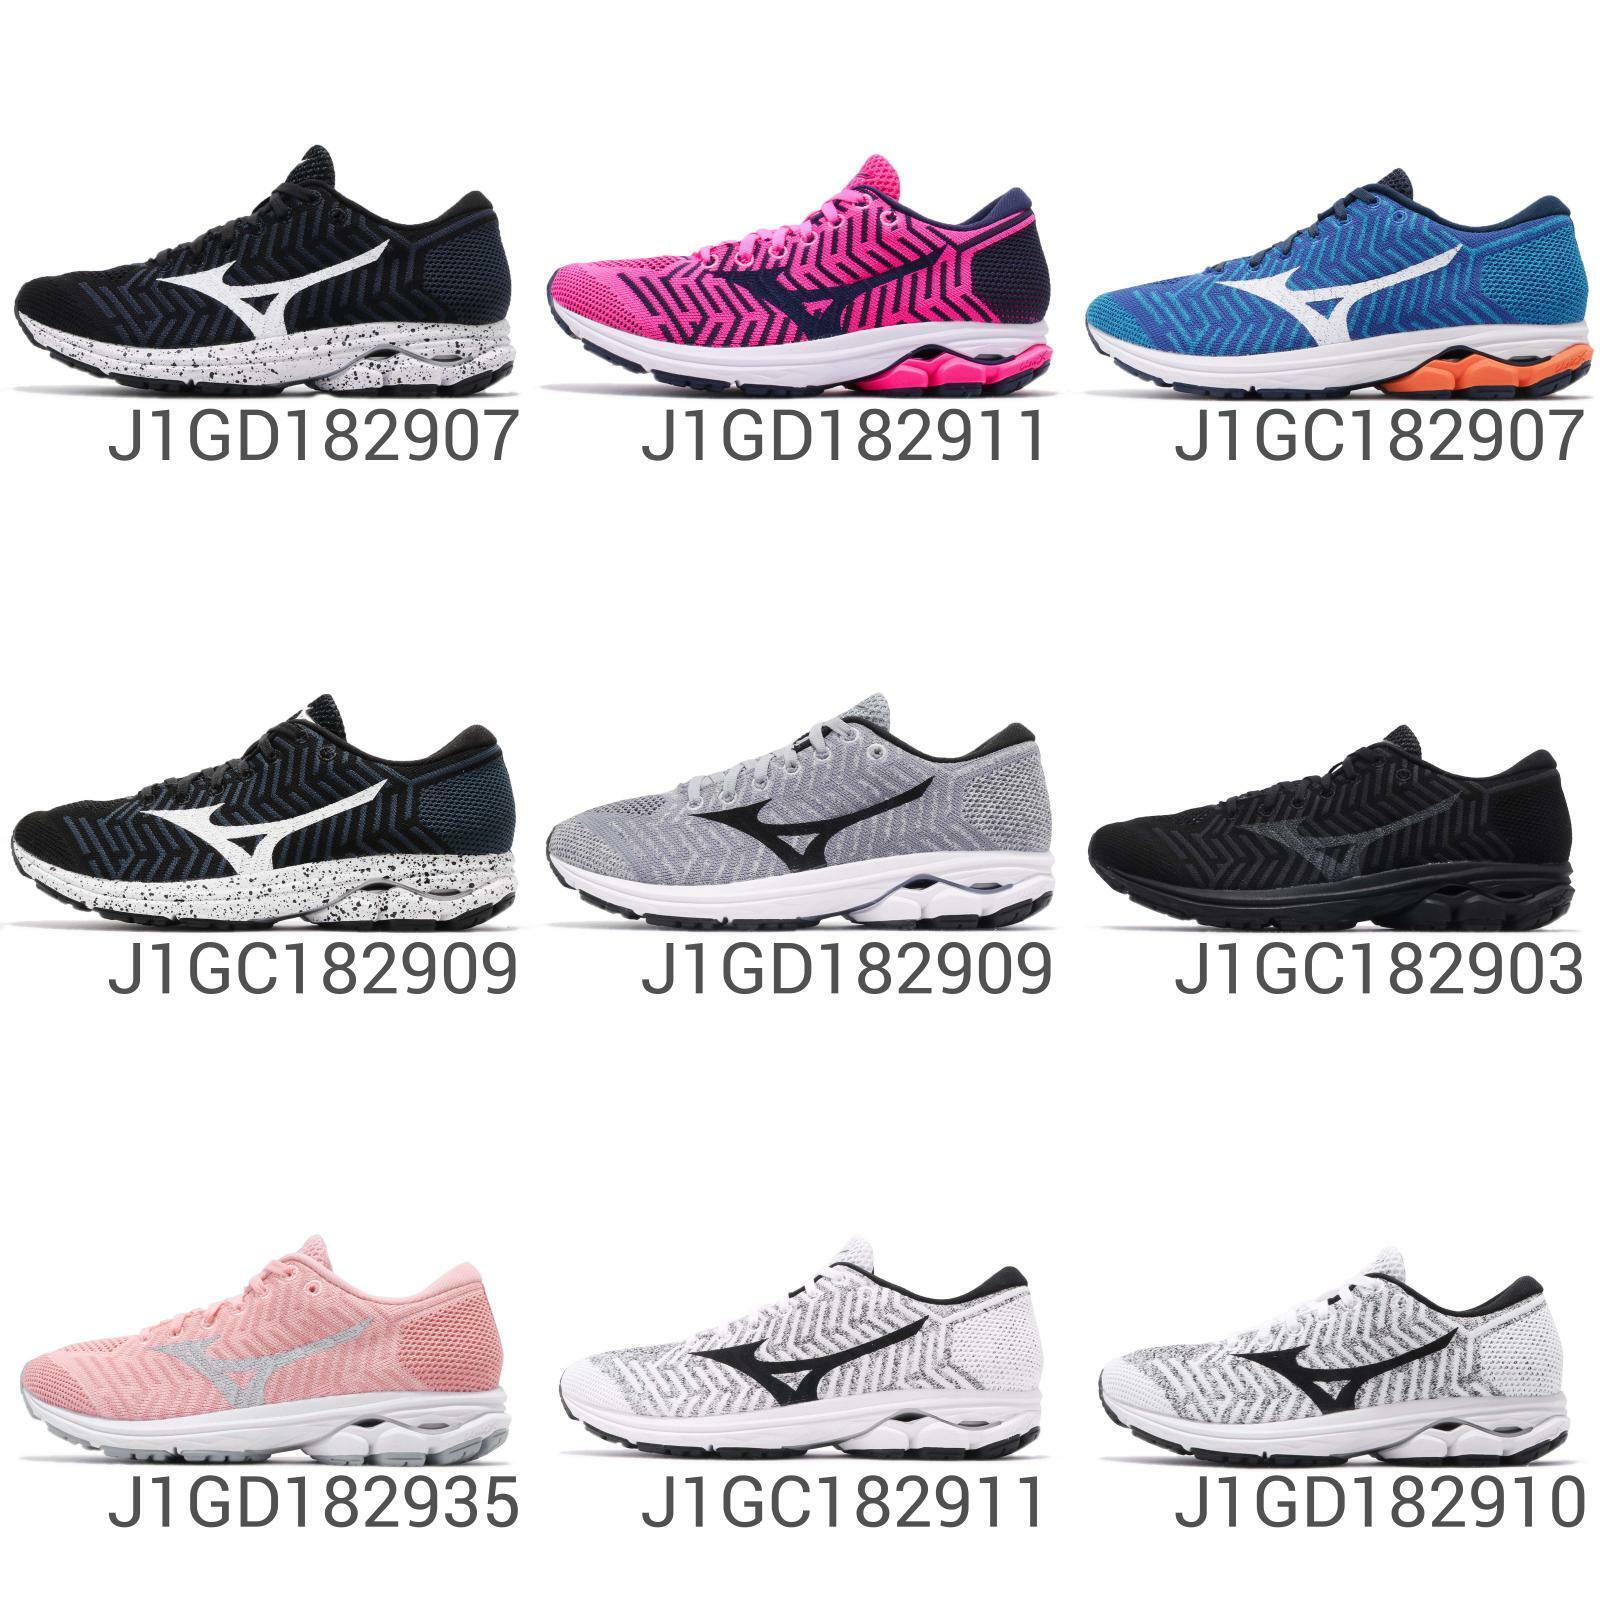 Mizuno WaveKnit R2 Mens donna Running scarpe scarpe da ginnastica ginnastica ginnastica Pick 1 | Negozio  | Uomo/Donna Scarpa  1477d4